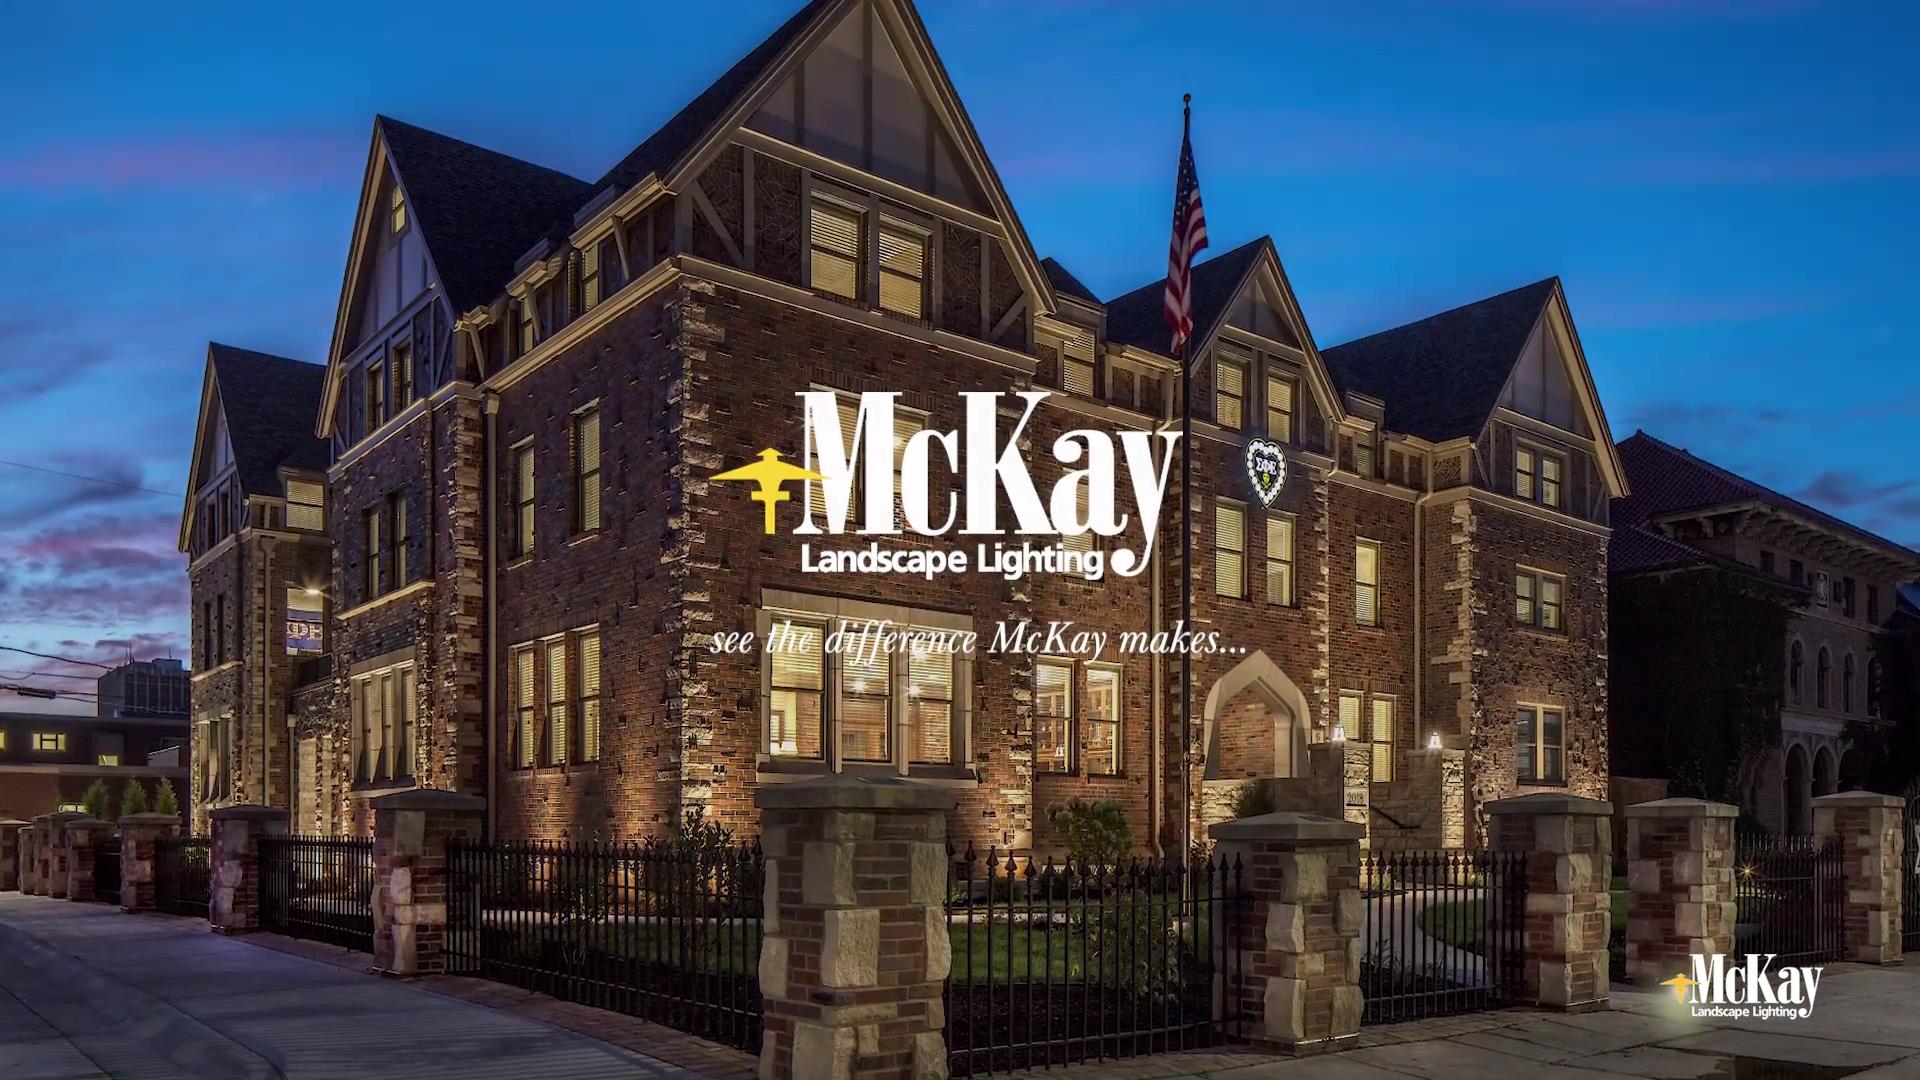 College Campus Energy Efficient LED Outdoor Lighting Lincoln Nebraska McKay Landscape Lighting